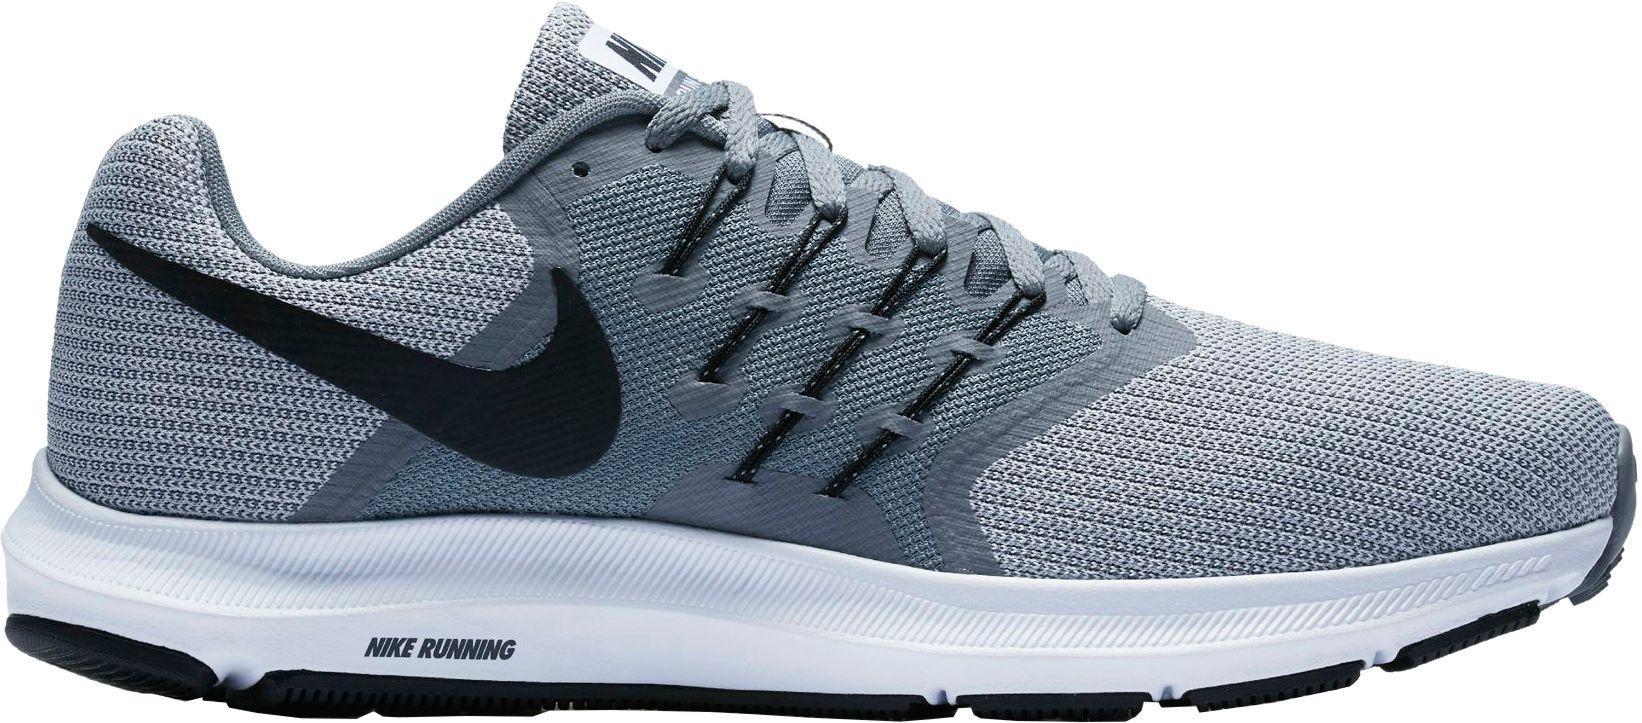 67f5de84d65cf Lyst - Nike Run Swift Running Shoes in Gray for Men